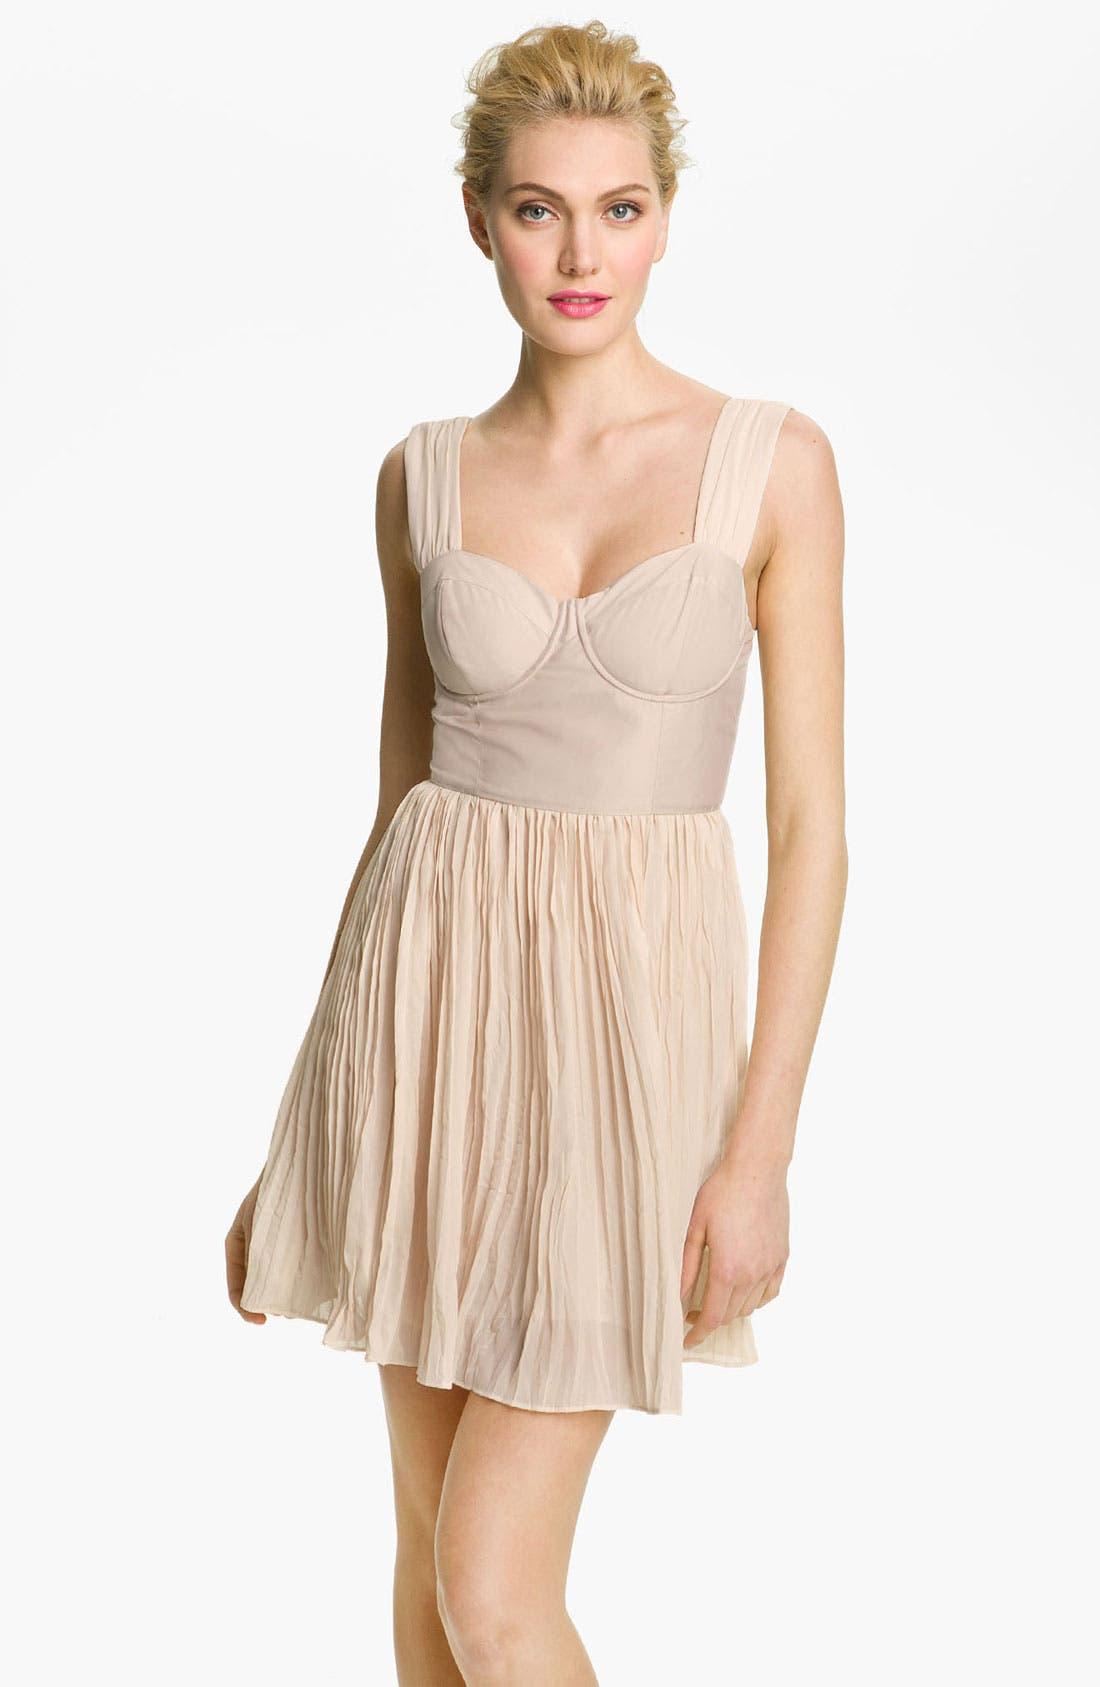 Alternate Image 1 Selected - BB Dakota 'Abella' Pleated Bustier Dress